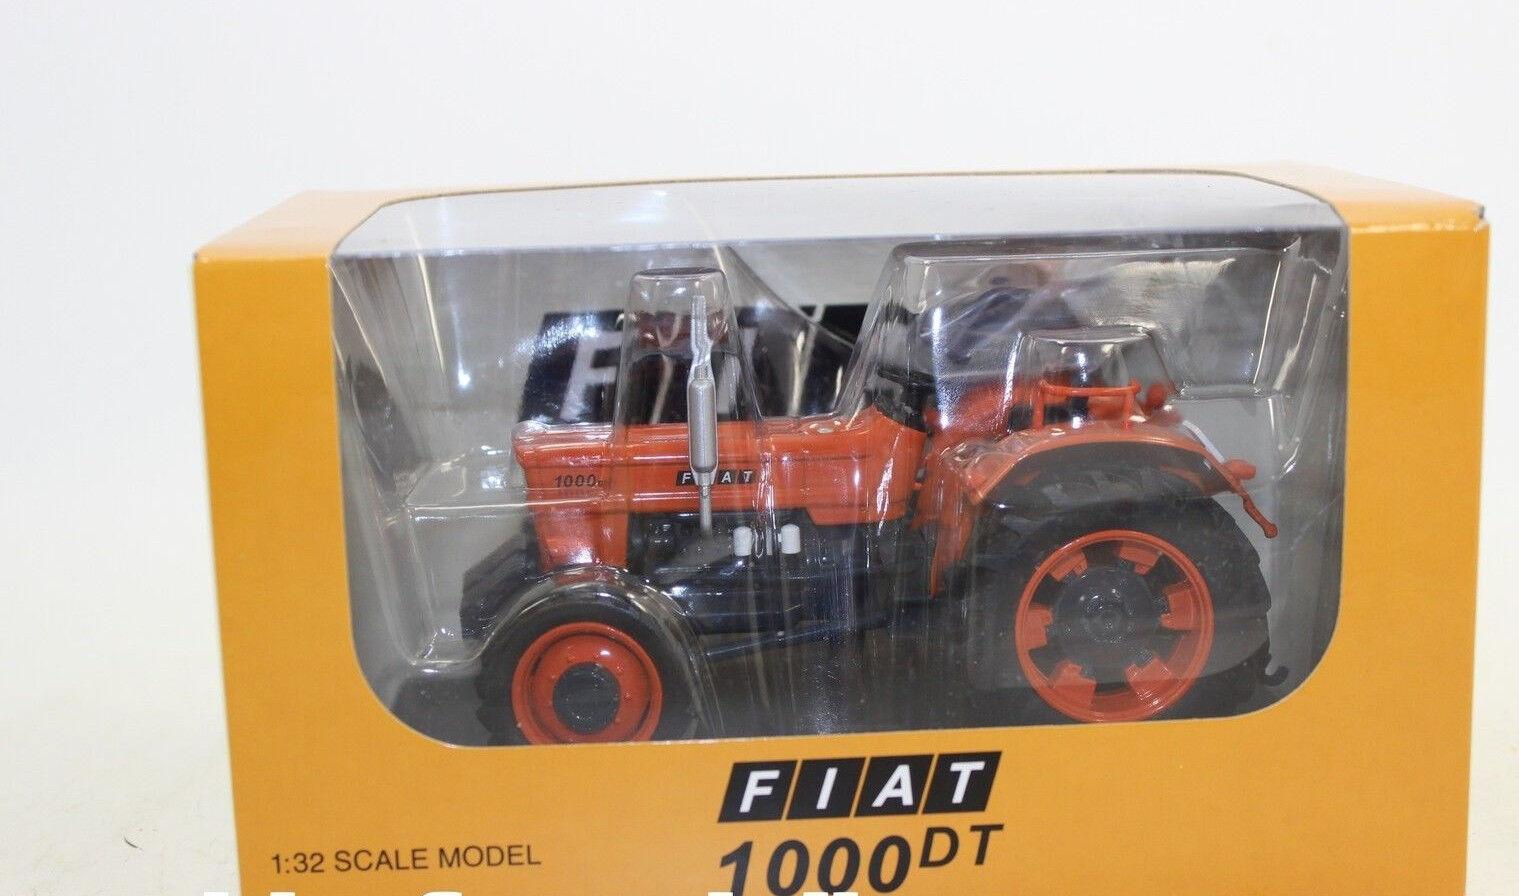 Replica Replica Replica Gri 051 Tractor Fiat 1000 Dt with Driver 1 3 2 New Boxed ff61ee